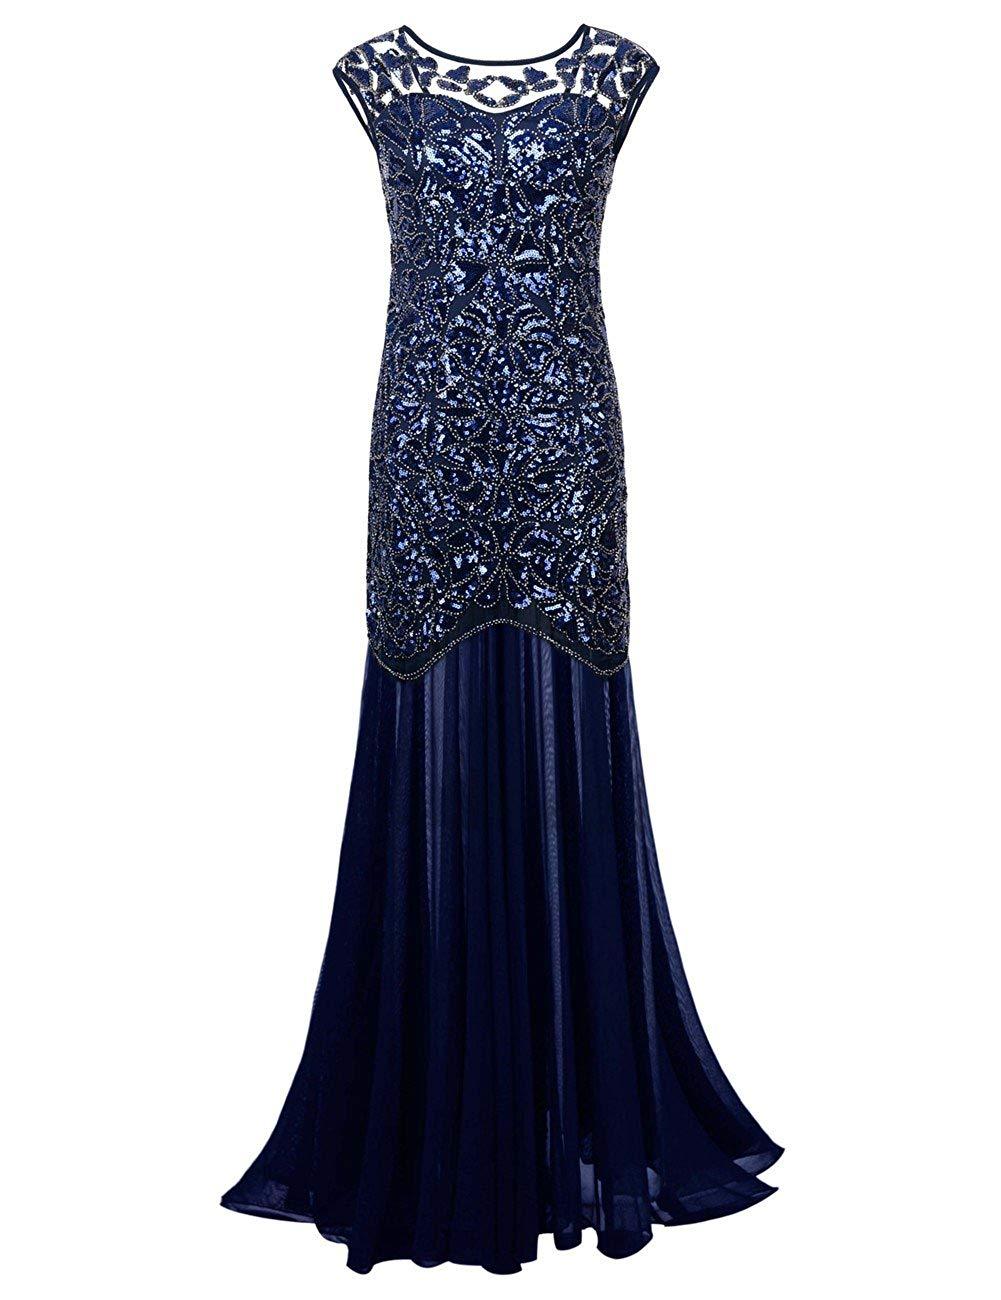 9b0bb901b2b4a Get Quotations · kayamiya Women's 1920s Beaded Sequin Floral Maxi Long  Gatsby Flapper Prom Dress